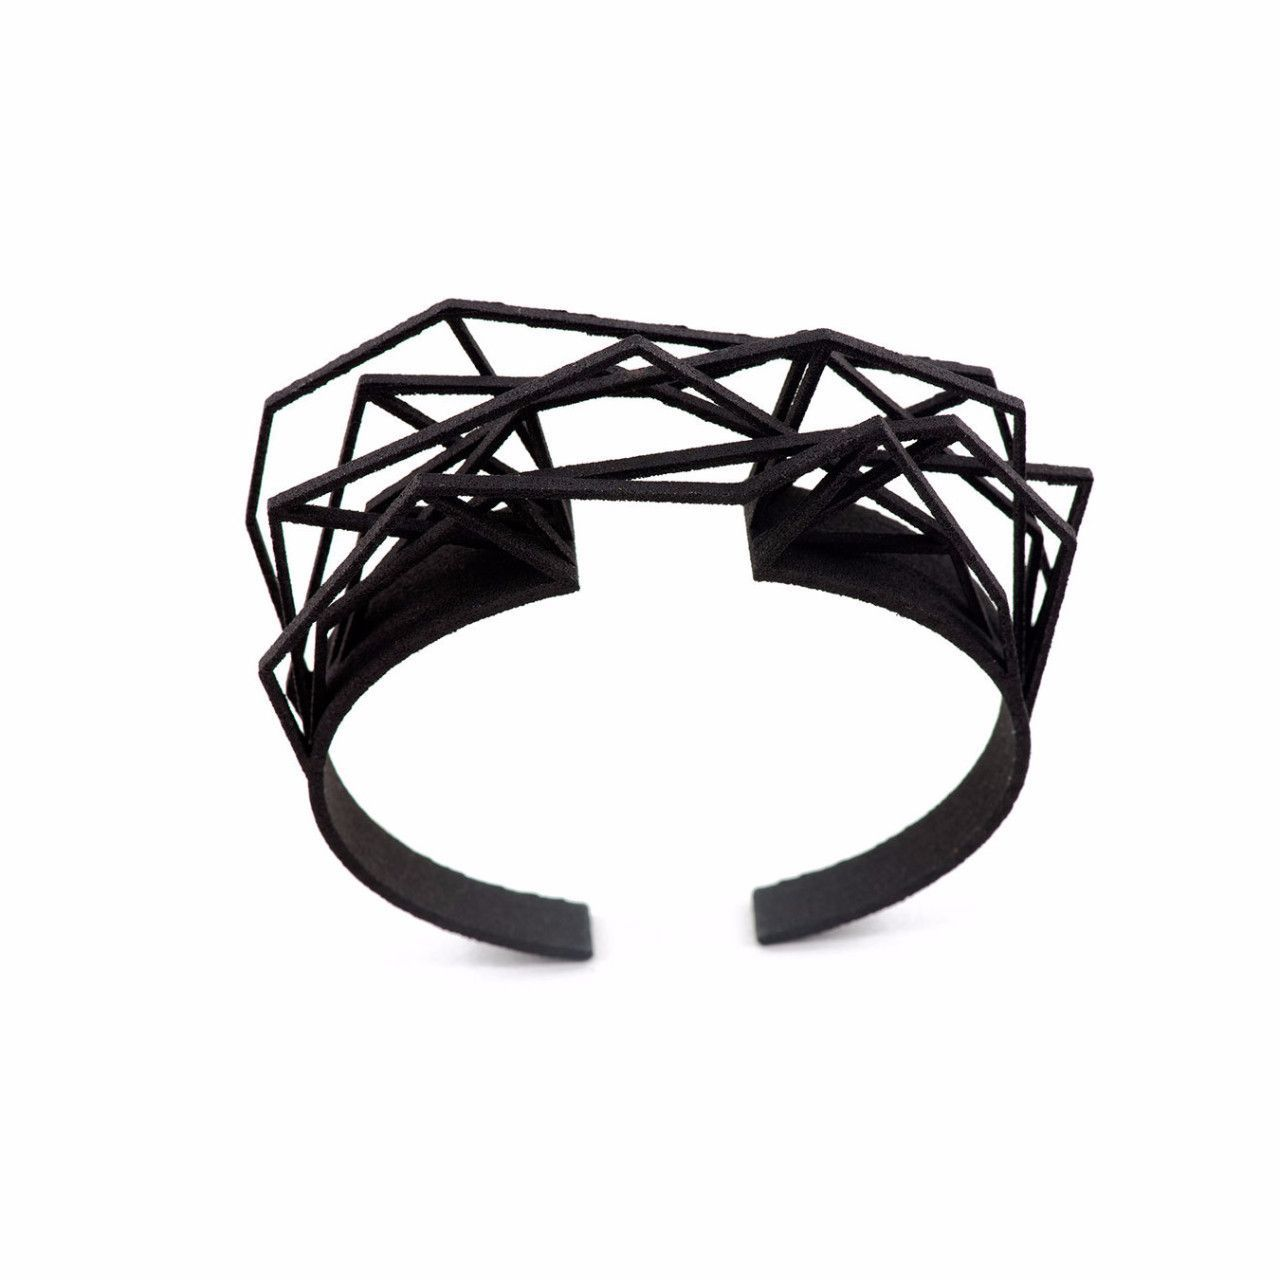 3D Printed Bracelet - Black Nylon